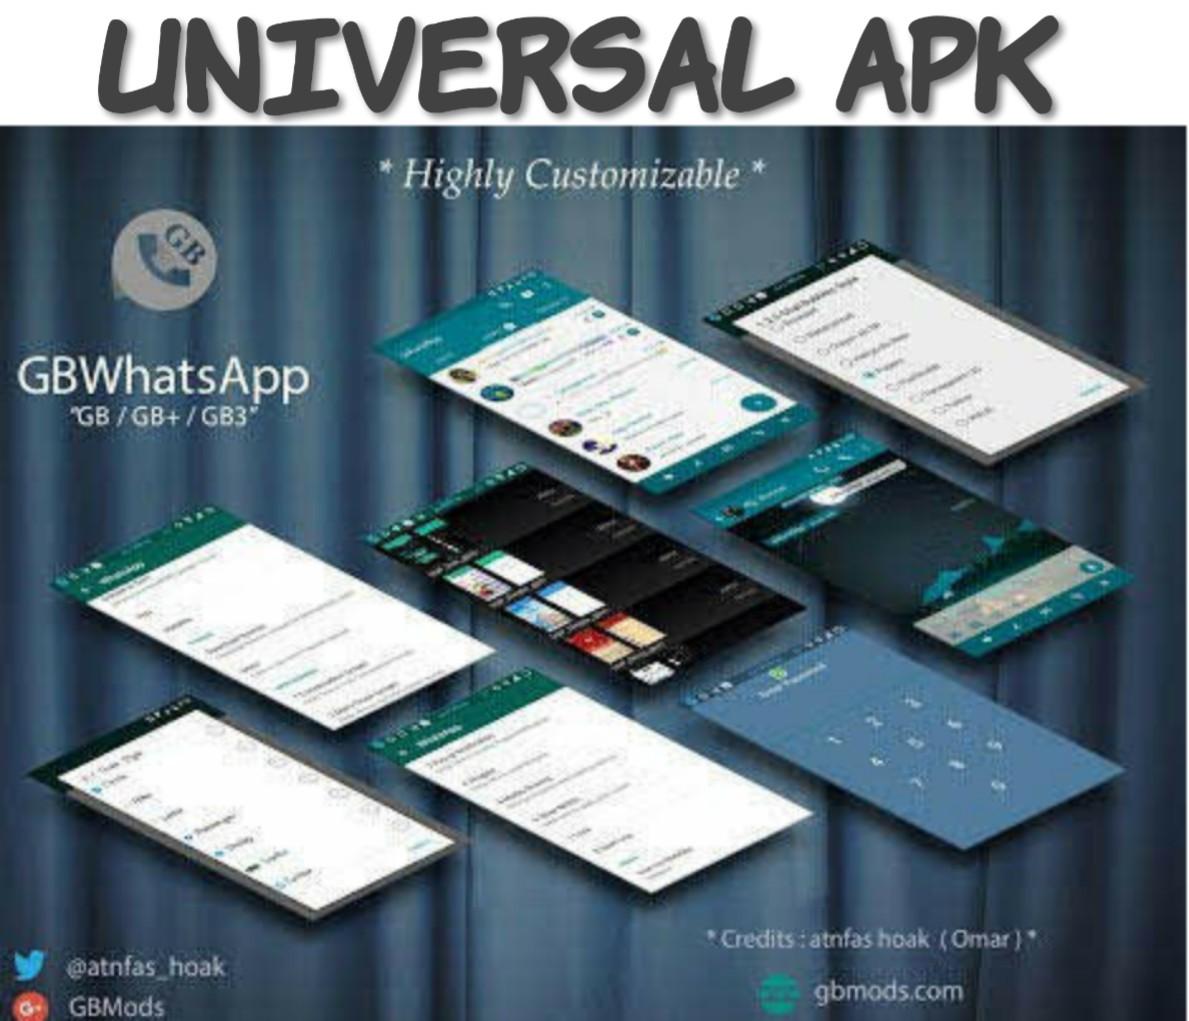 gbwhatsapp 6.55 apk download